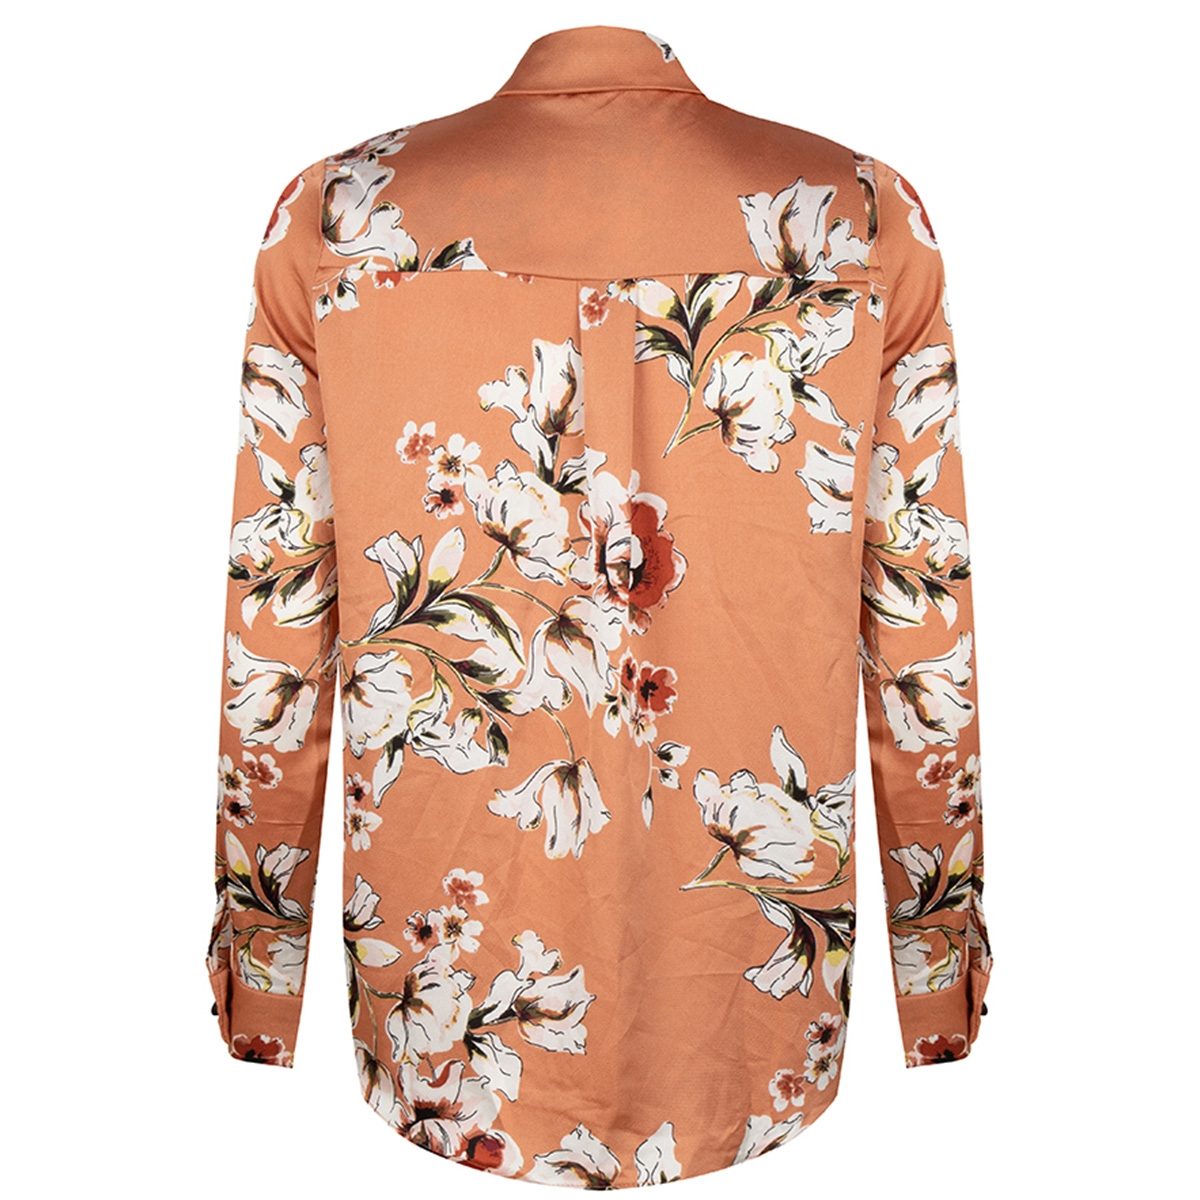 blouse solange mg25 lofty manner blouse 755 peach